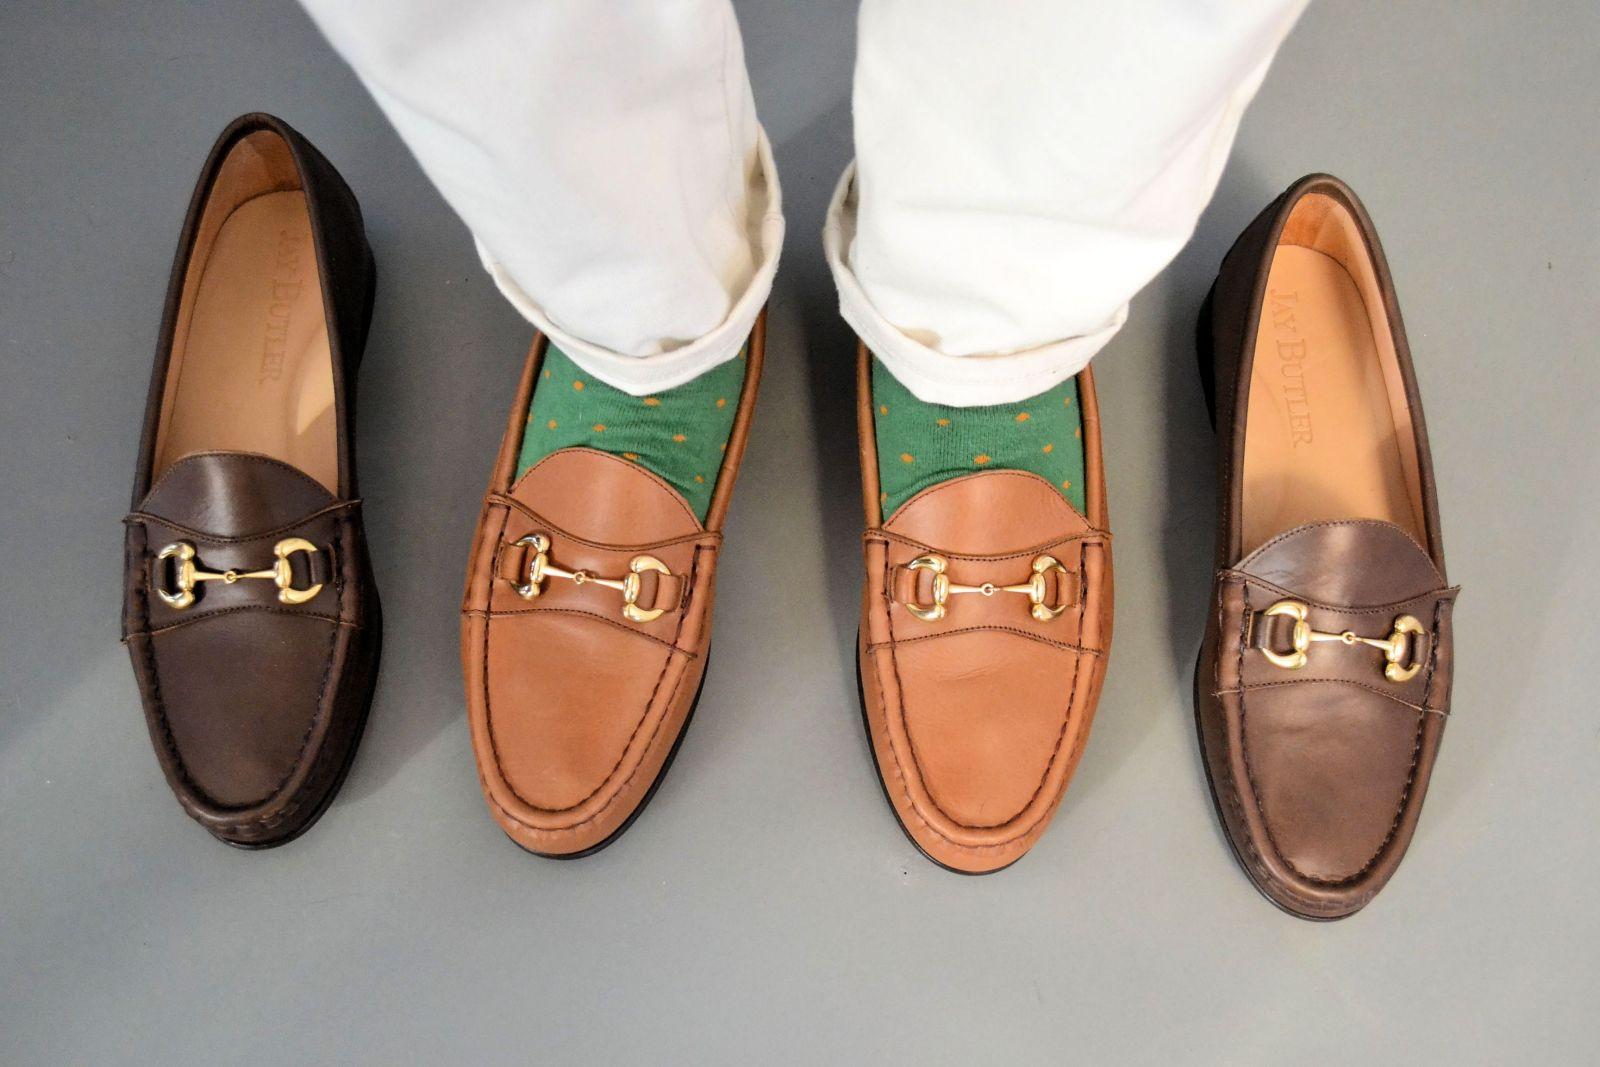 Jay Butler Horsebit Loafers